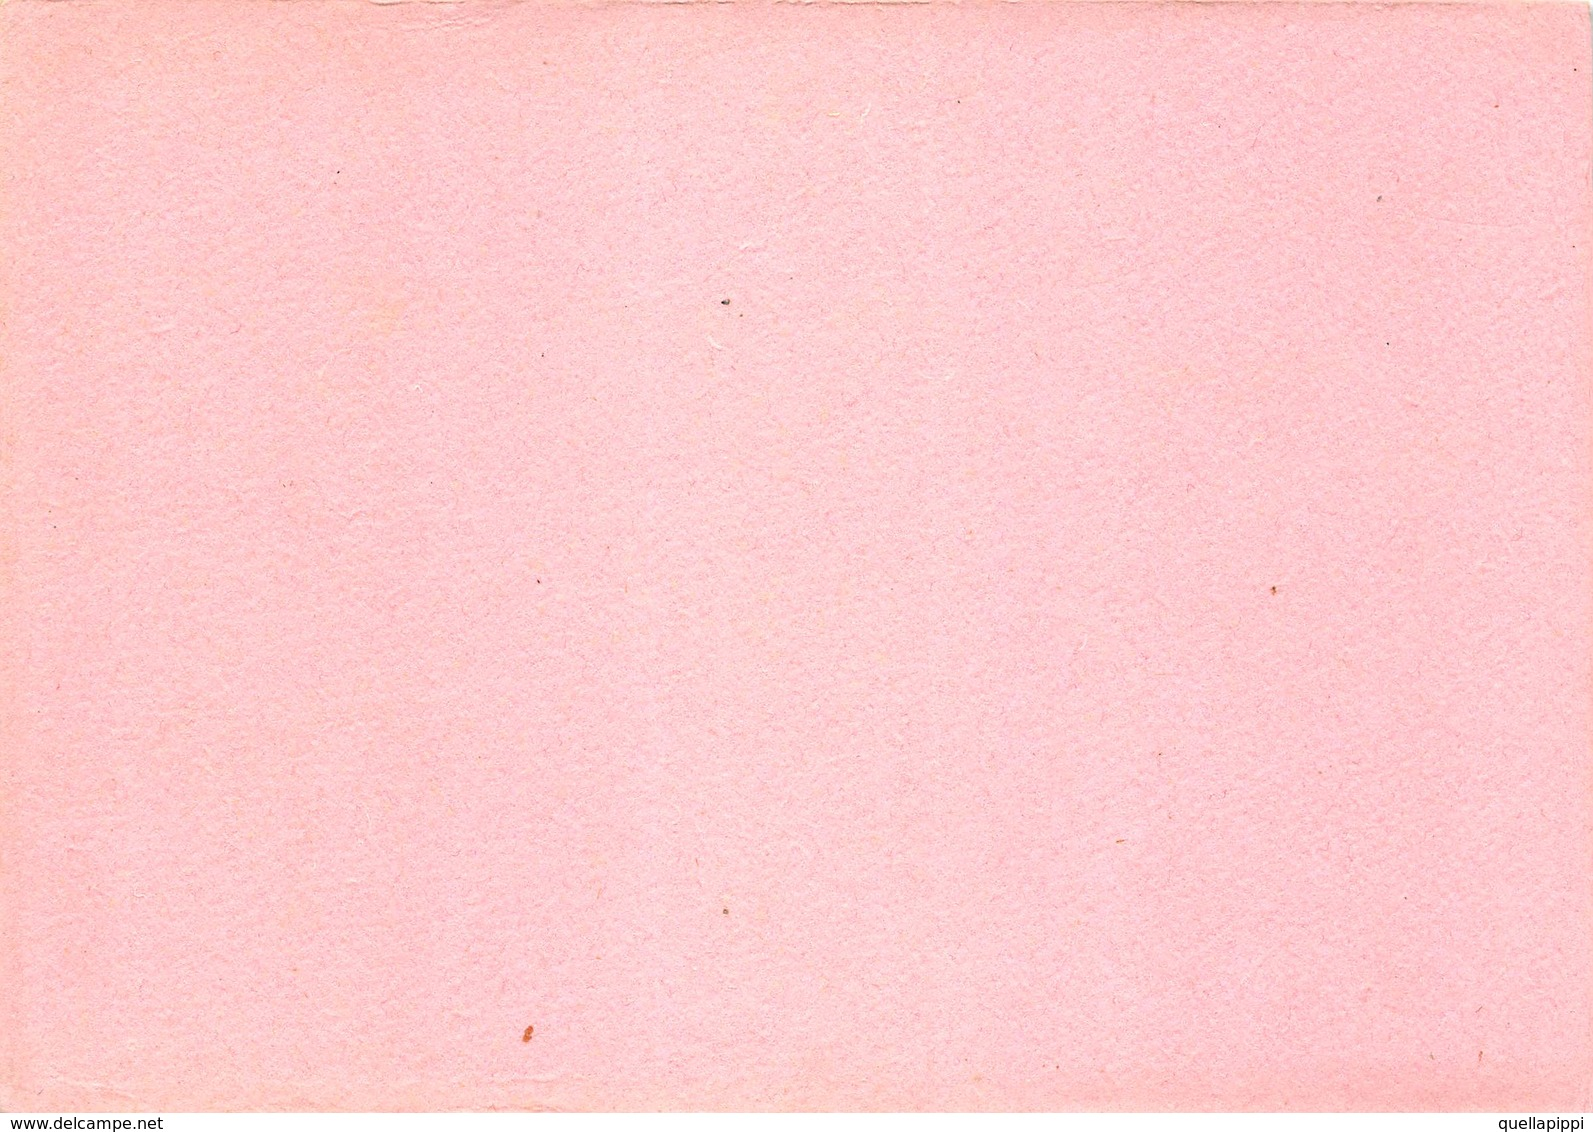 "08840 ""MILANO - GEIGY S.A.- MEDOMINA - IL FARMACO PER DORMIRE - CALENDARIO NOVEMBRE 1952"" CARTA ASSORBENTE ORIG. - Alimentare"